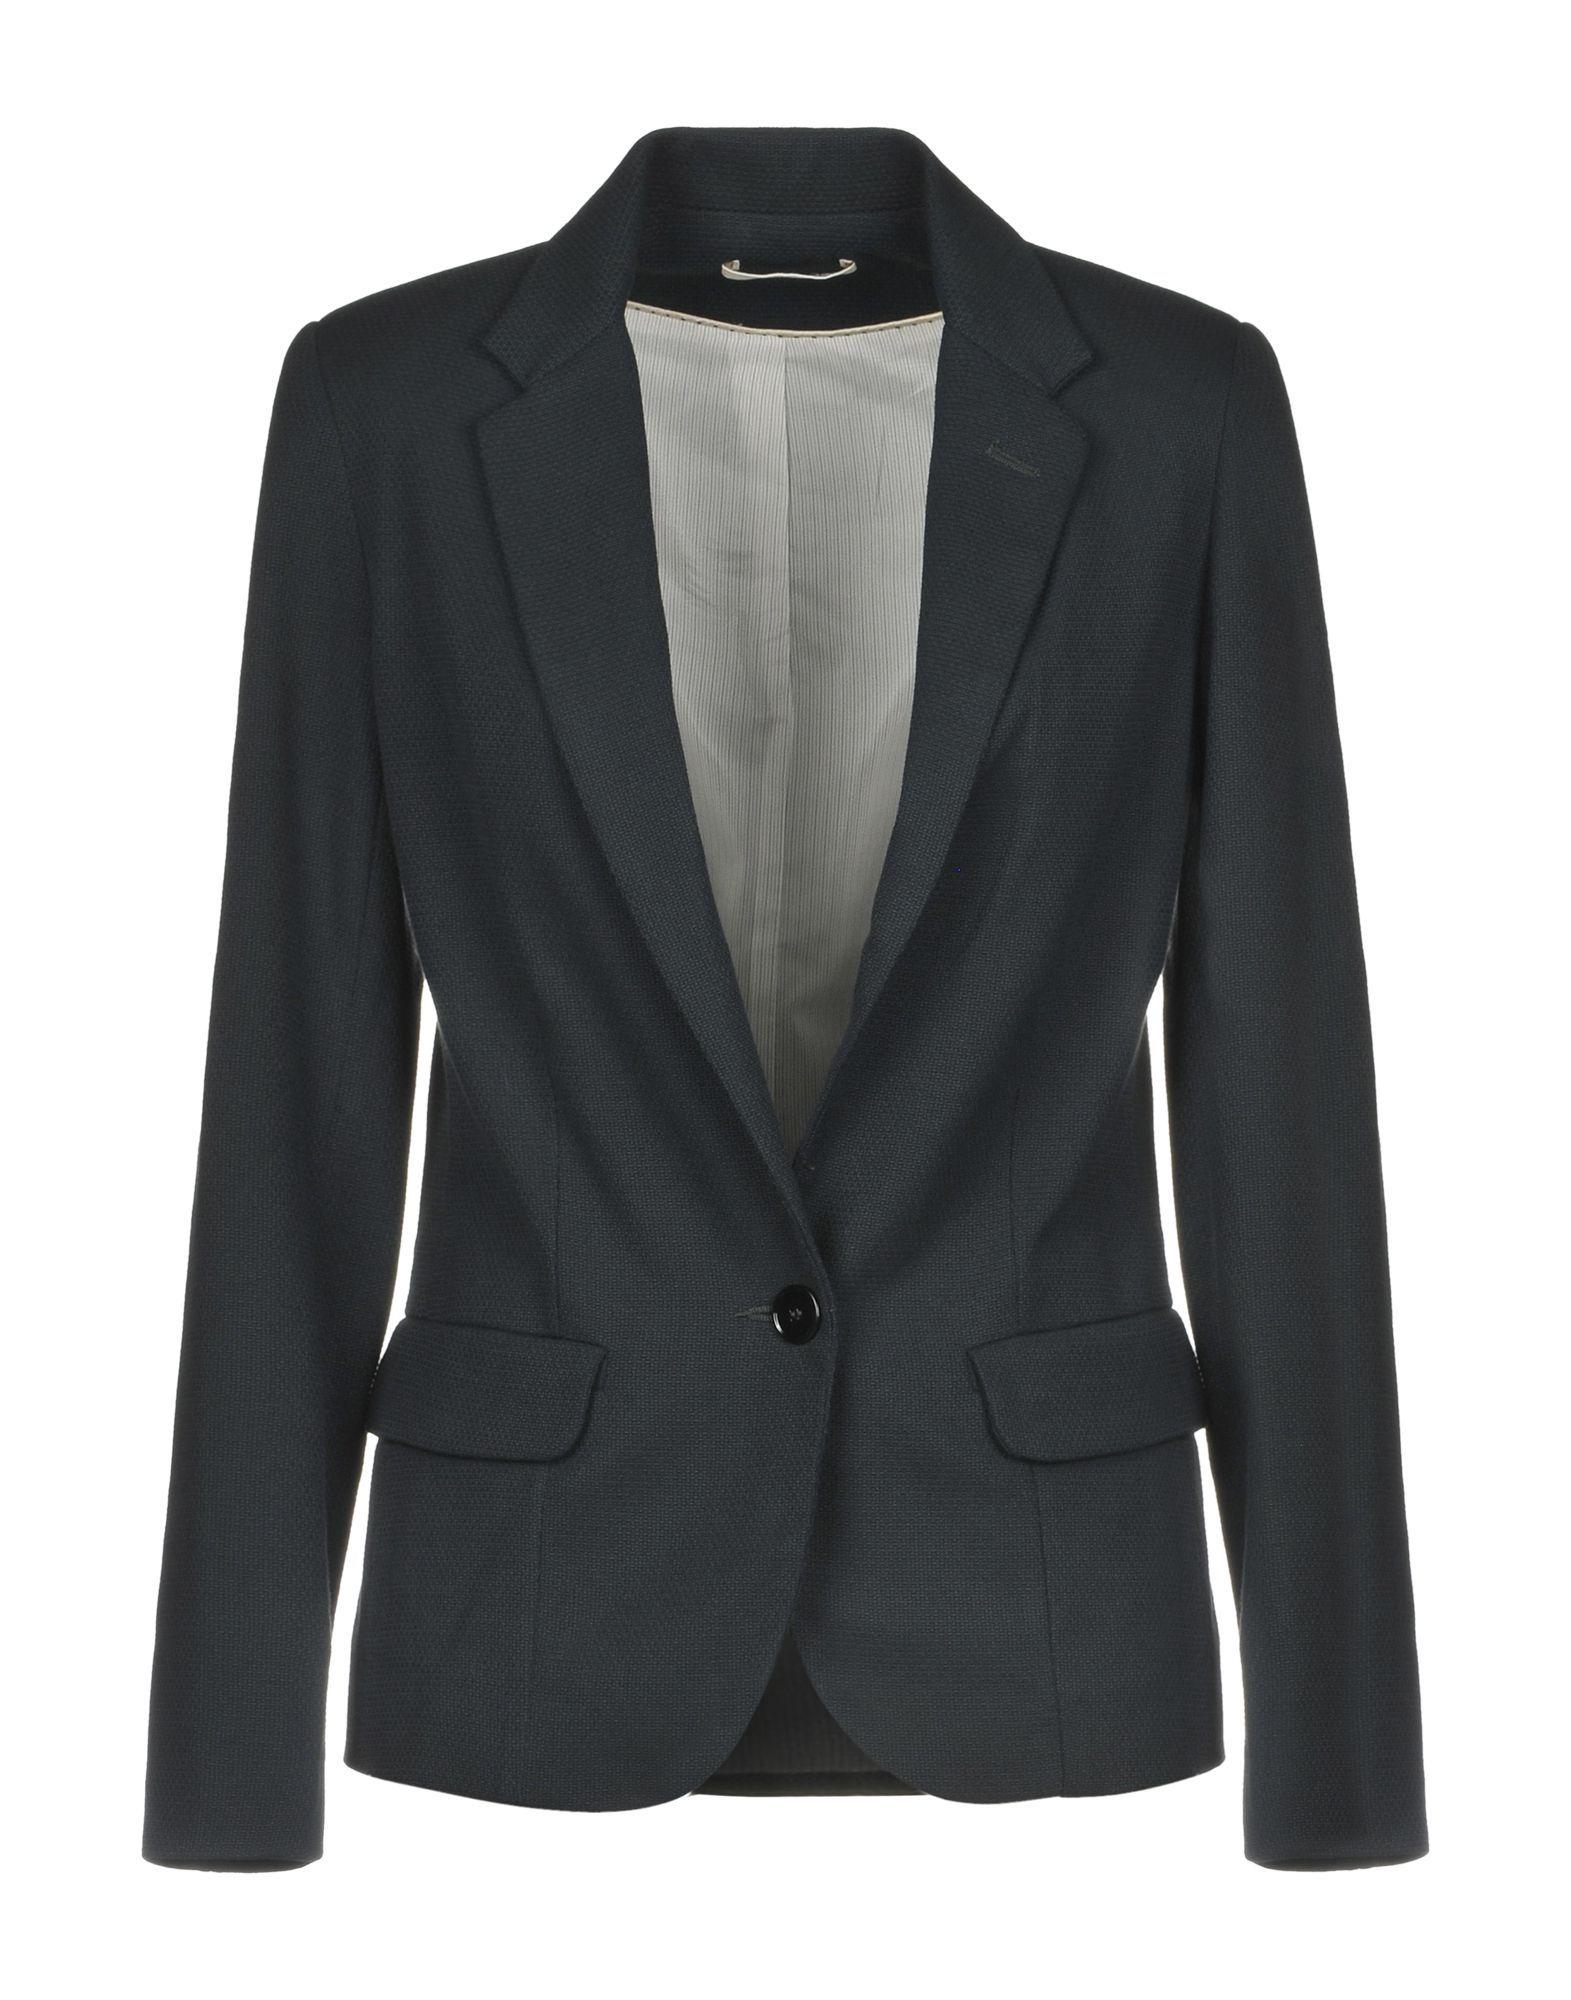 Sessun Dark Green Single Breasted Jacket